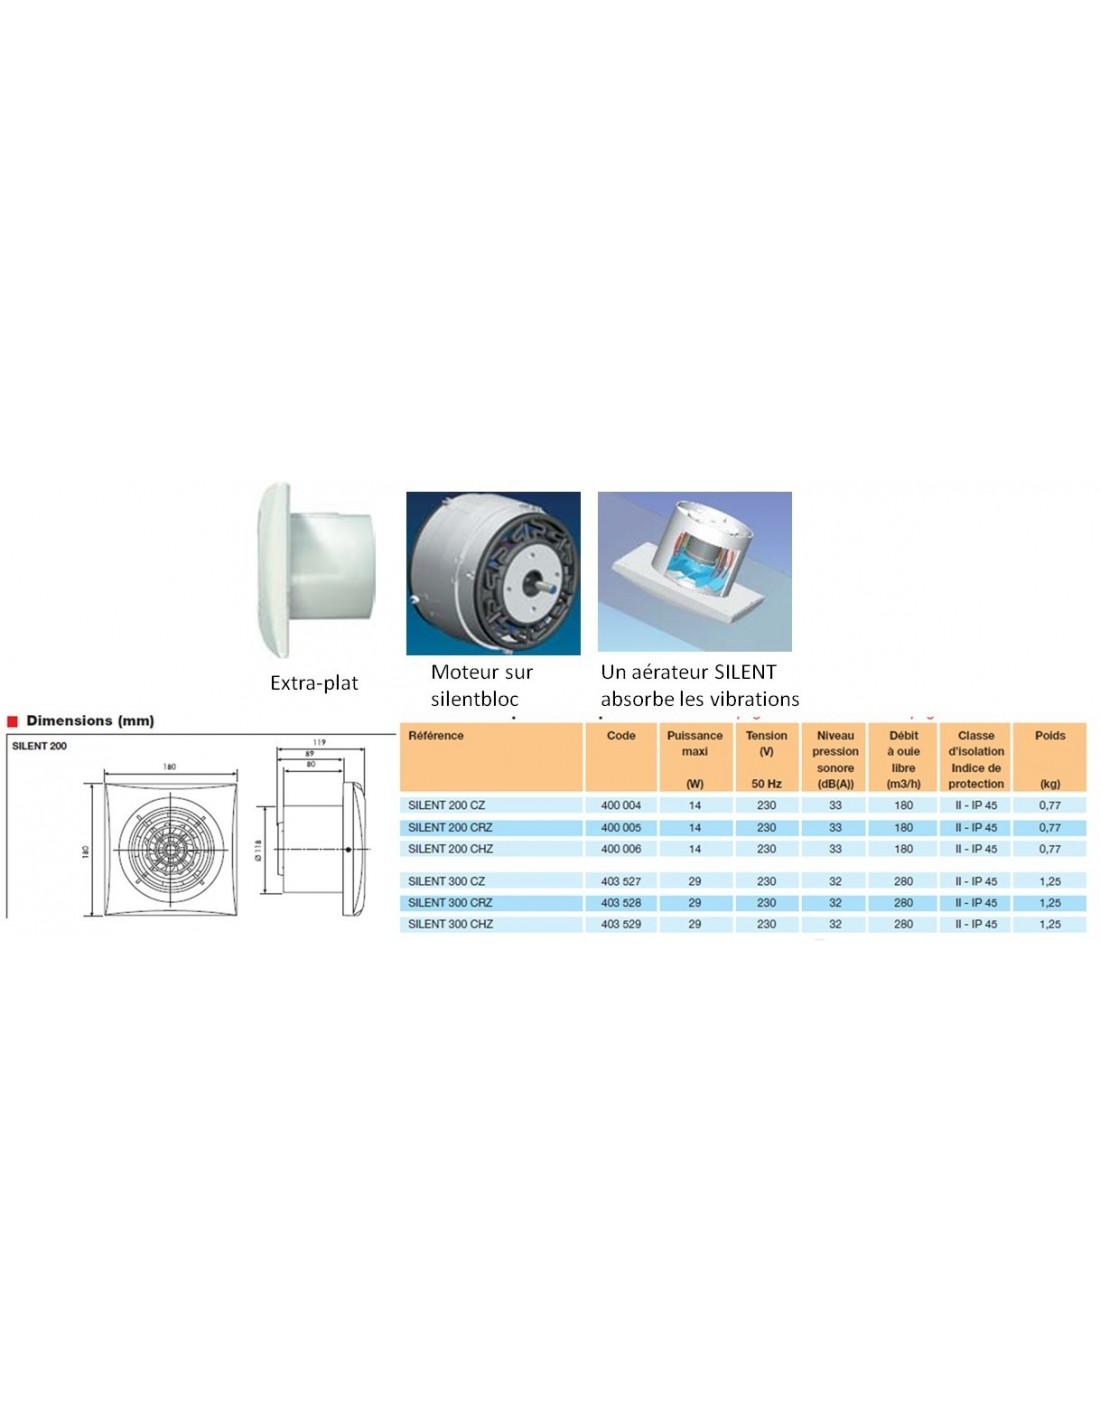 Extracteur dair unelvent ultrasilencieux temporisé hygro silent 200